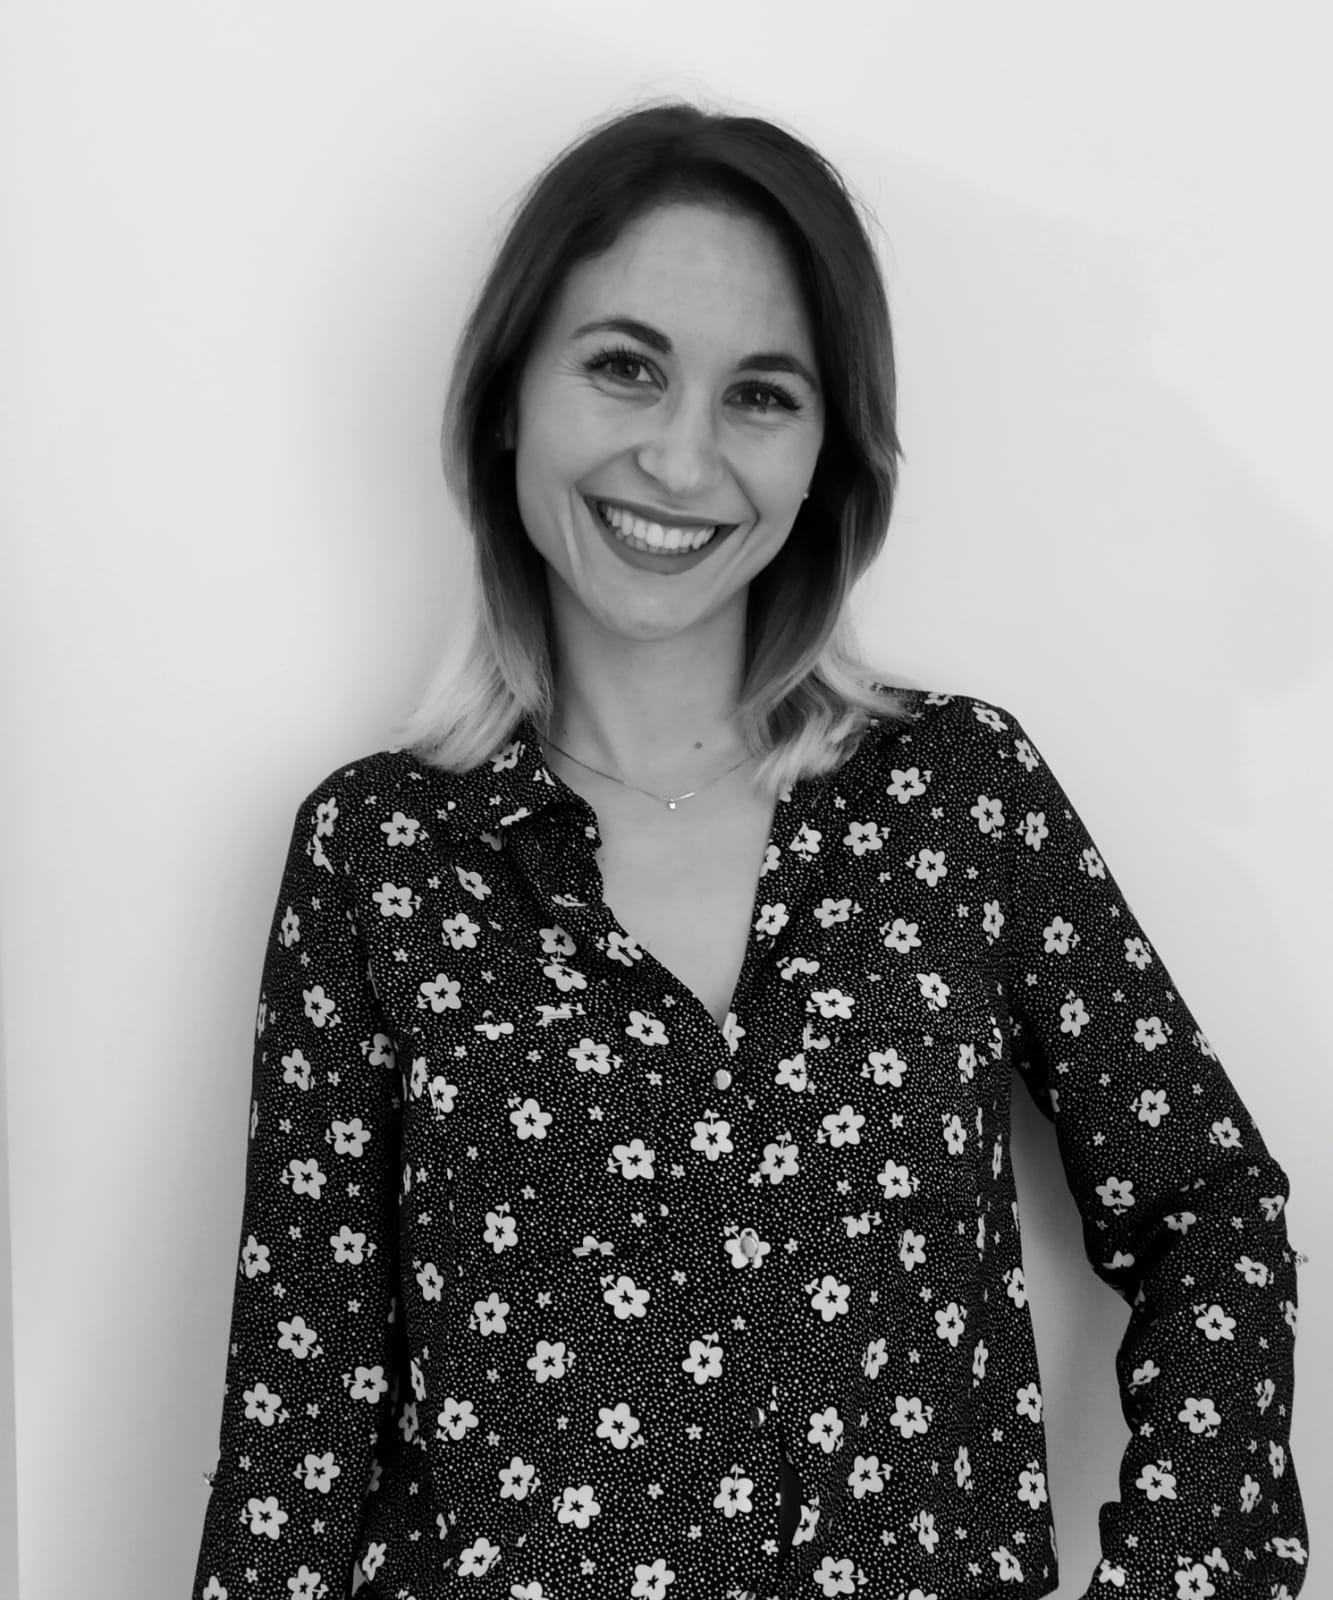 Beatrice Pavoni